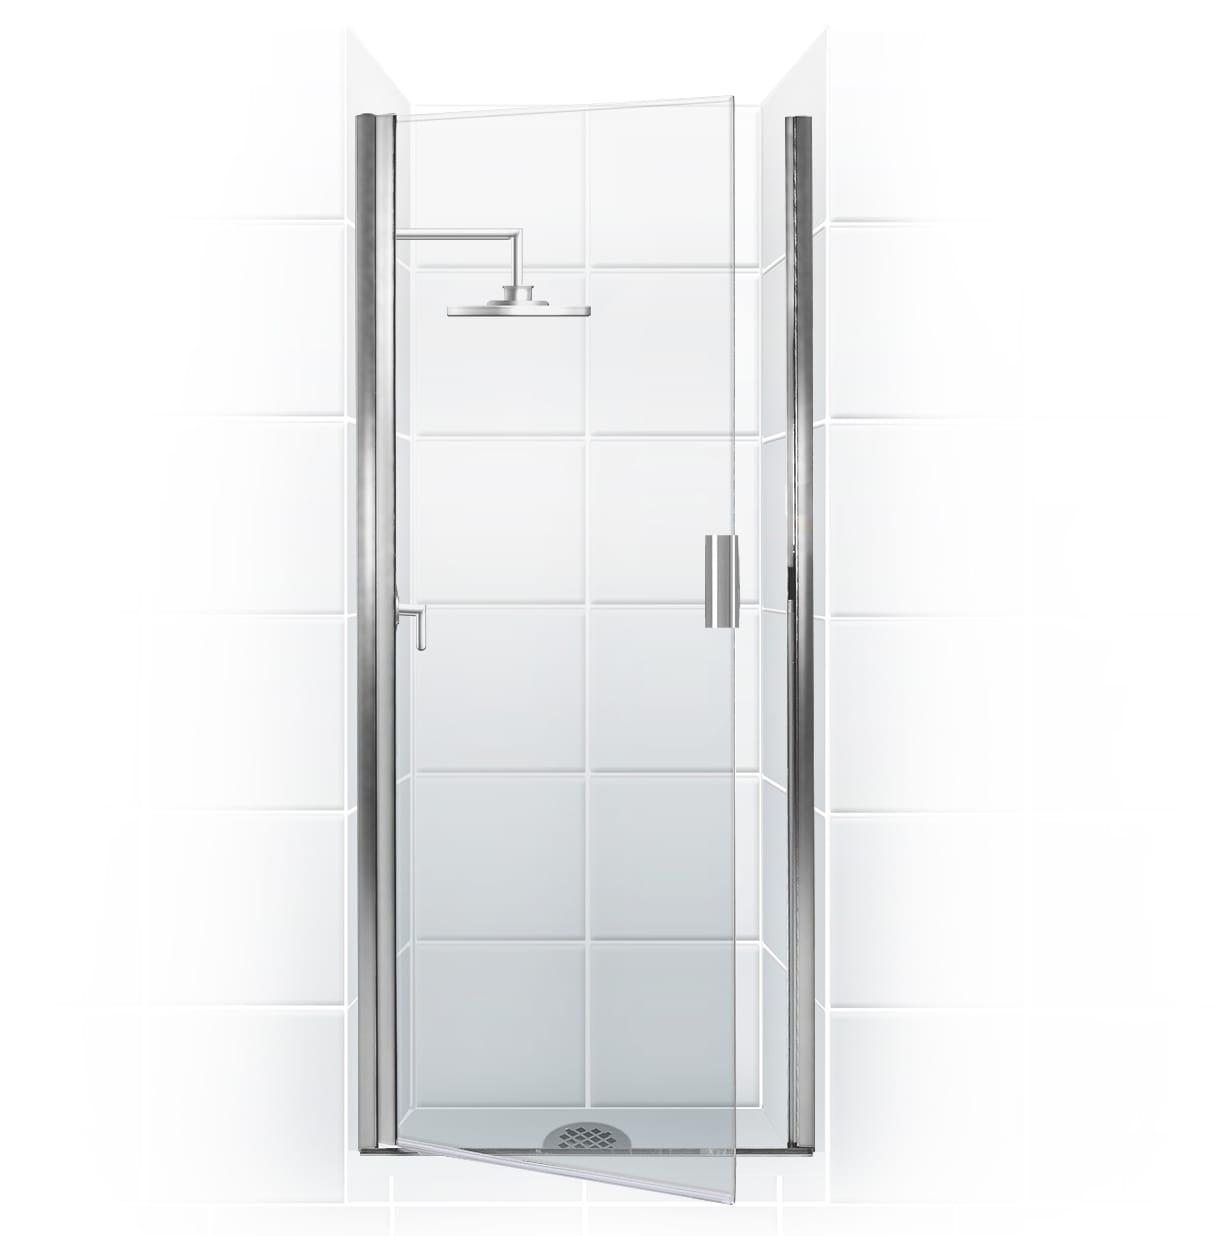 Coastal Shower Doors Pqfr35 66 C